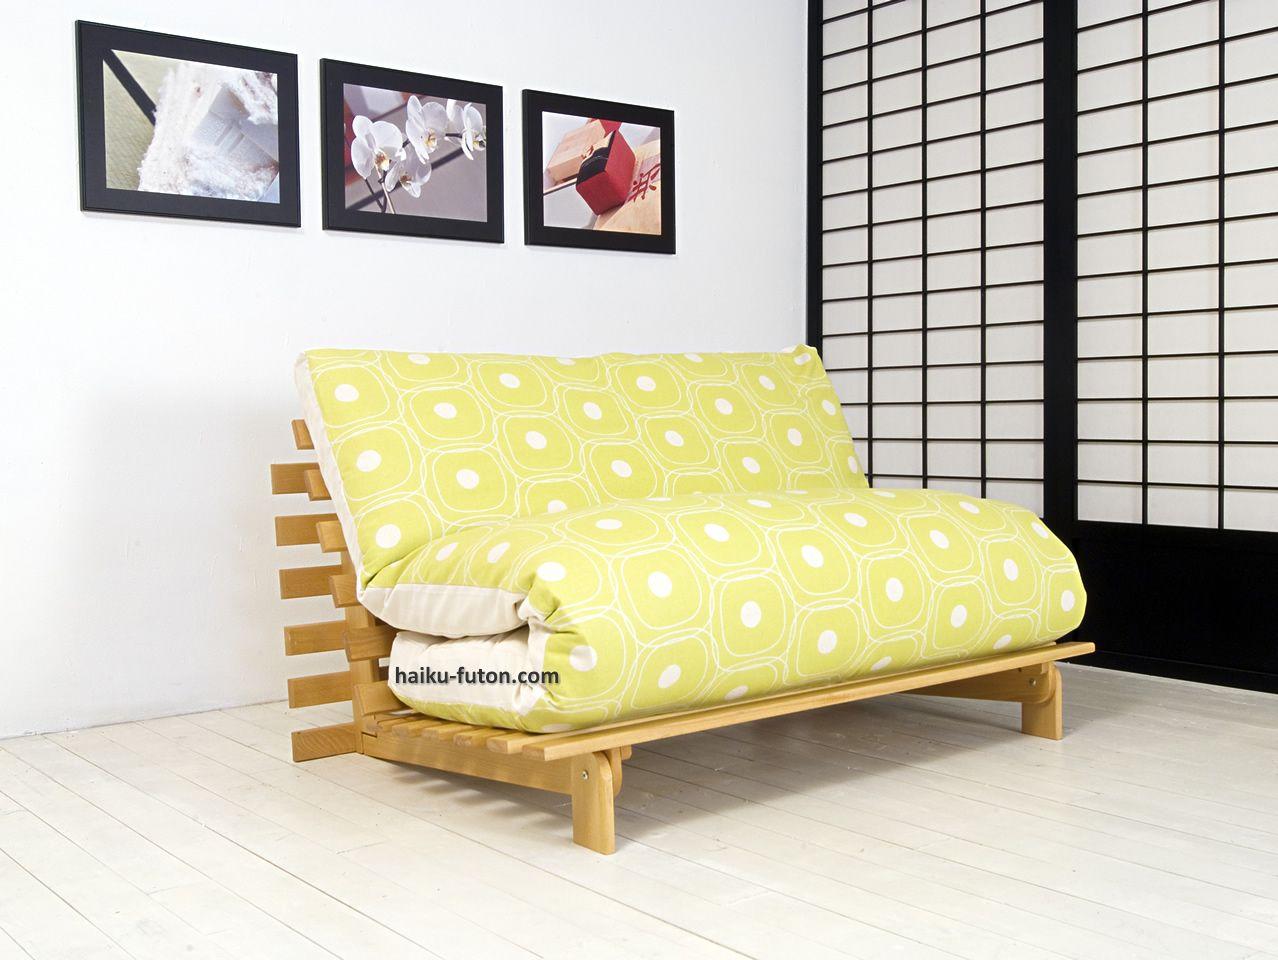 Futon sof cama plegable la estructura del futon sof cama for Como hacer un sillon con una cama